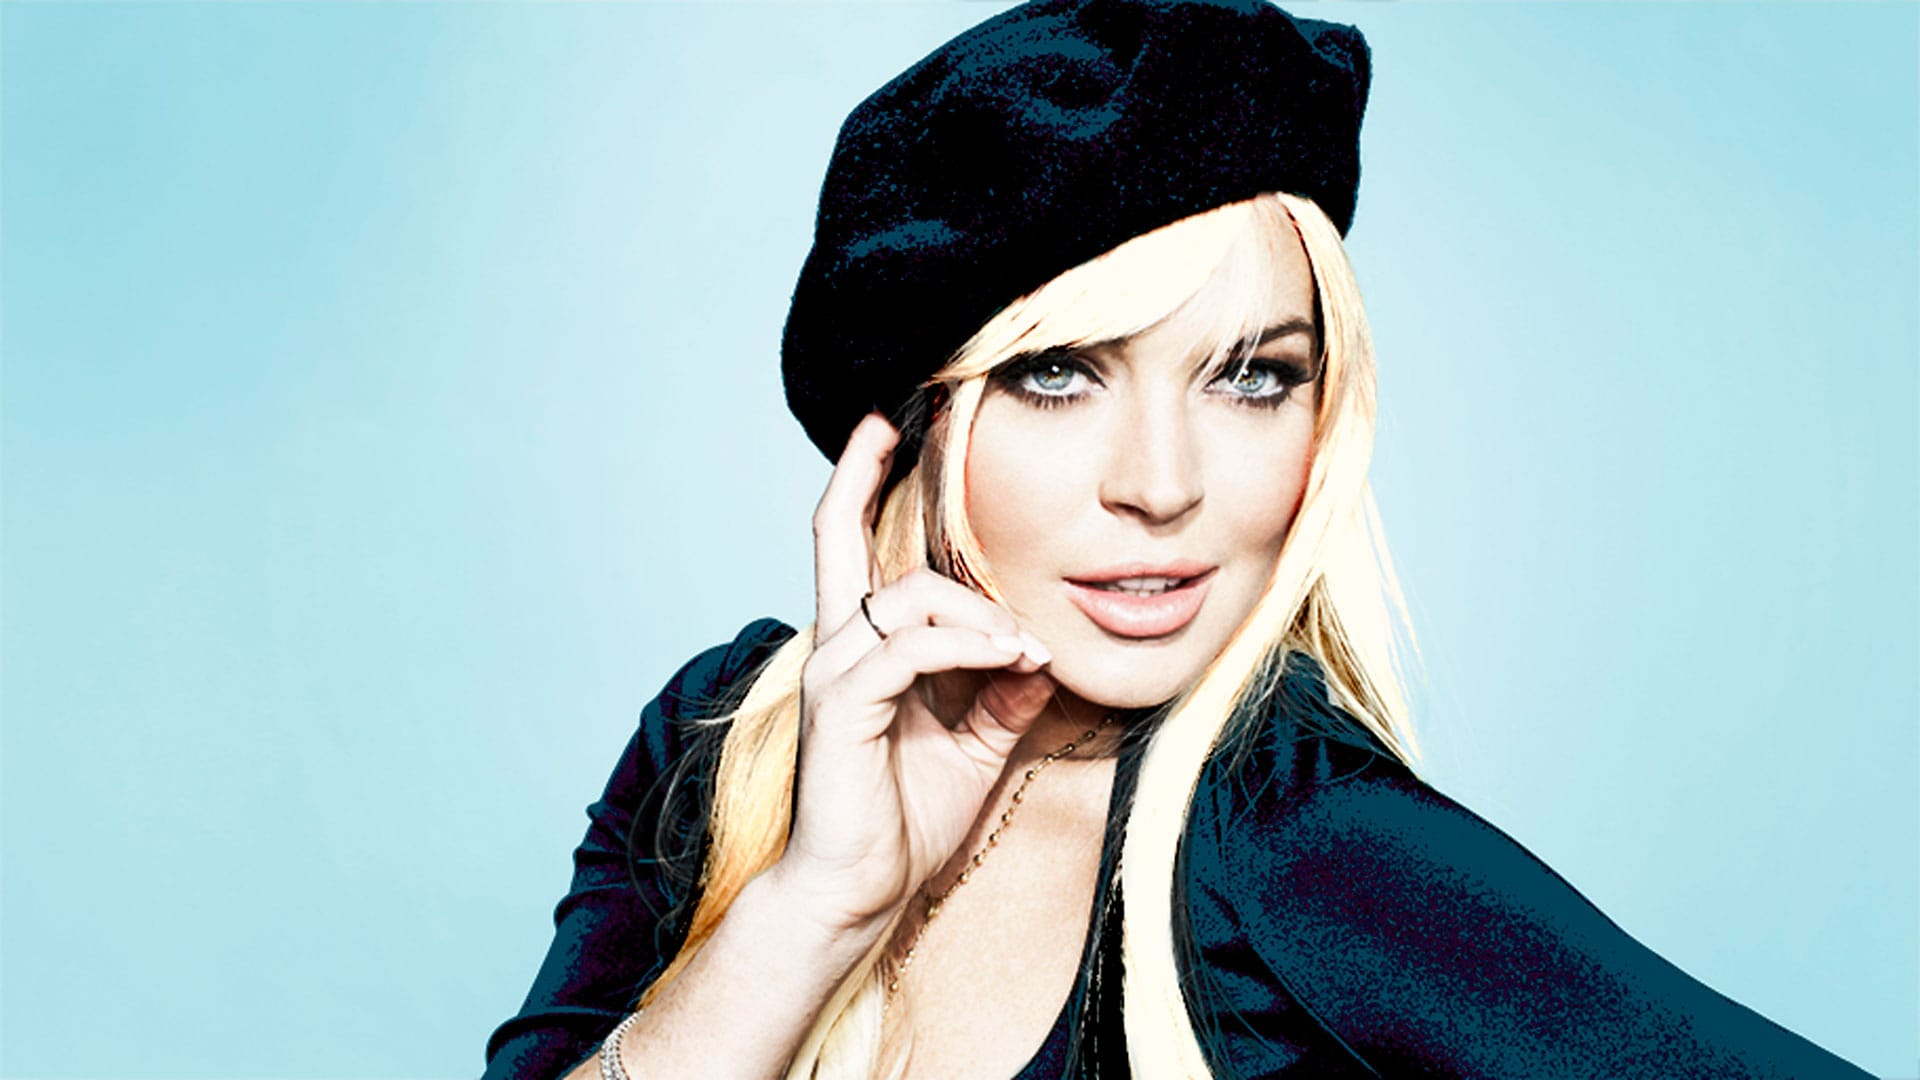 Lindsay Lohan: March 3, 2012